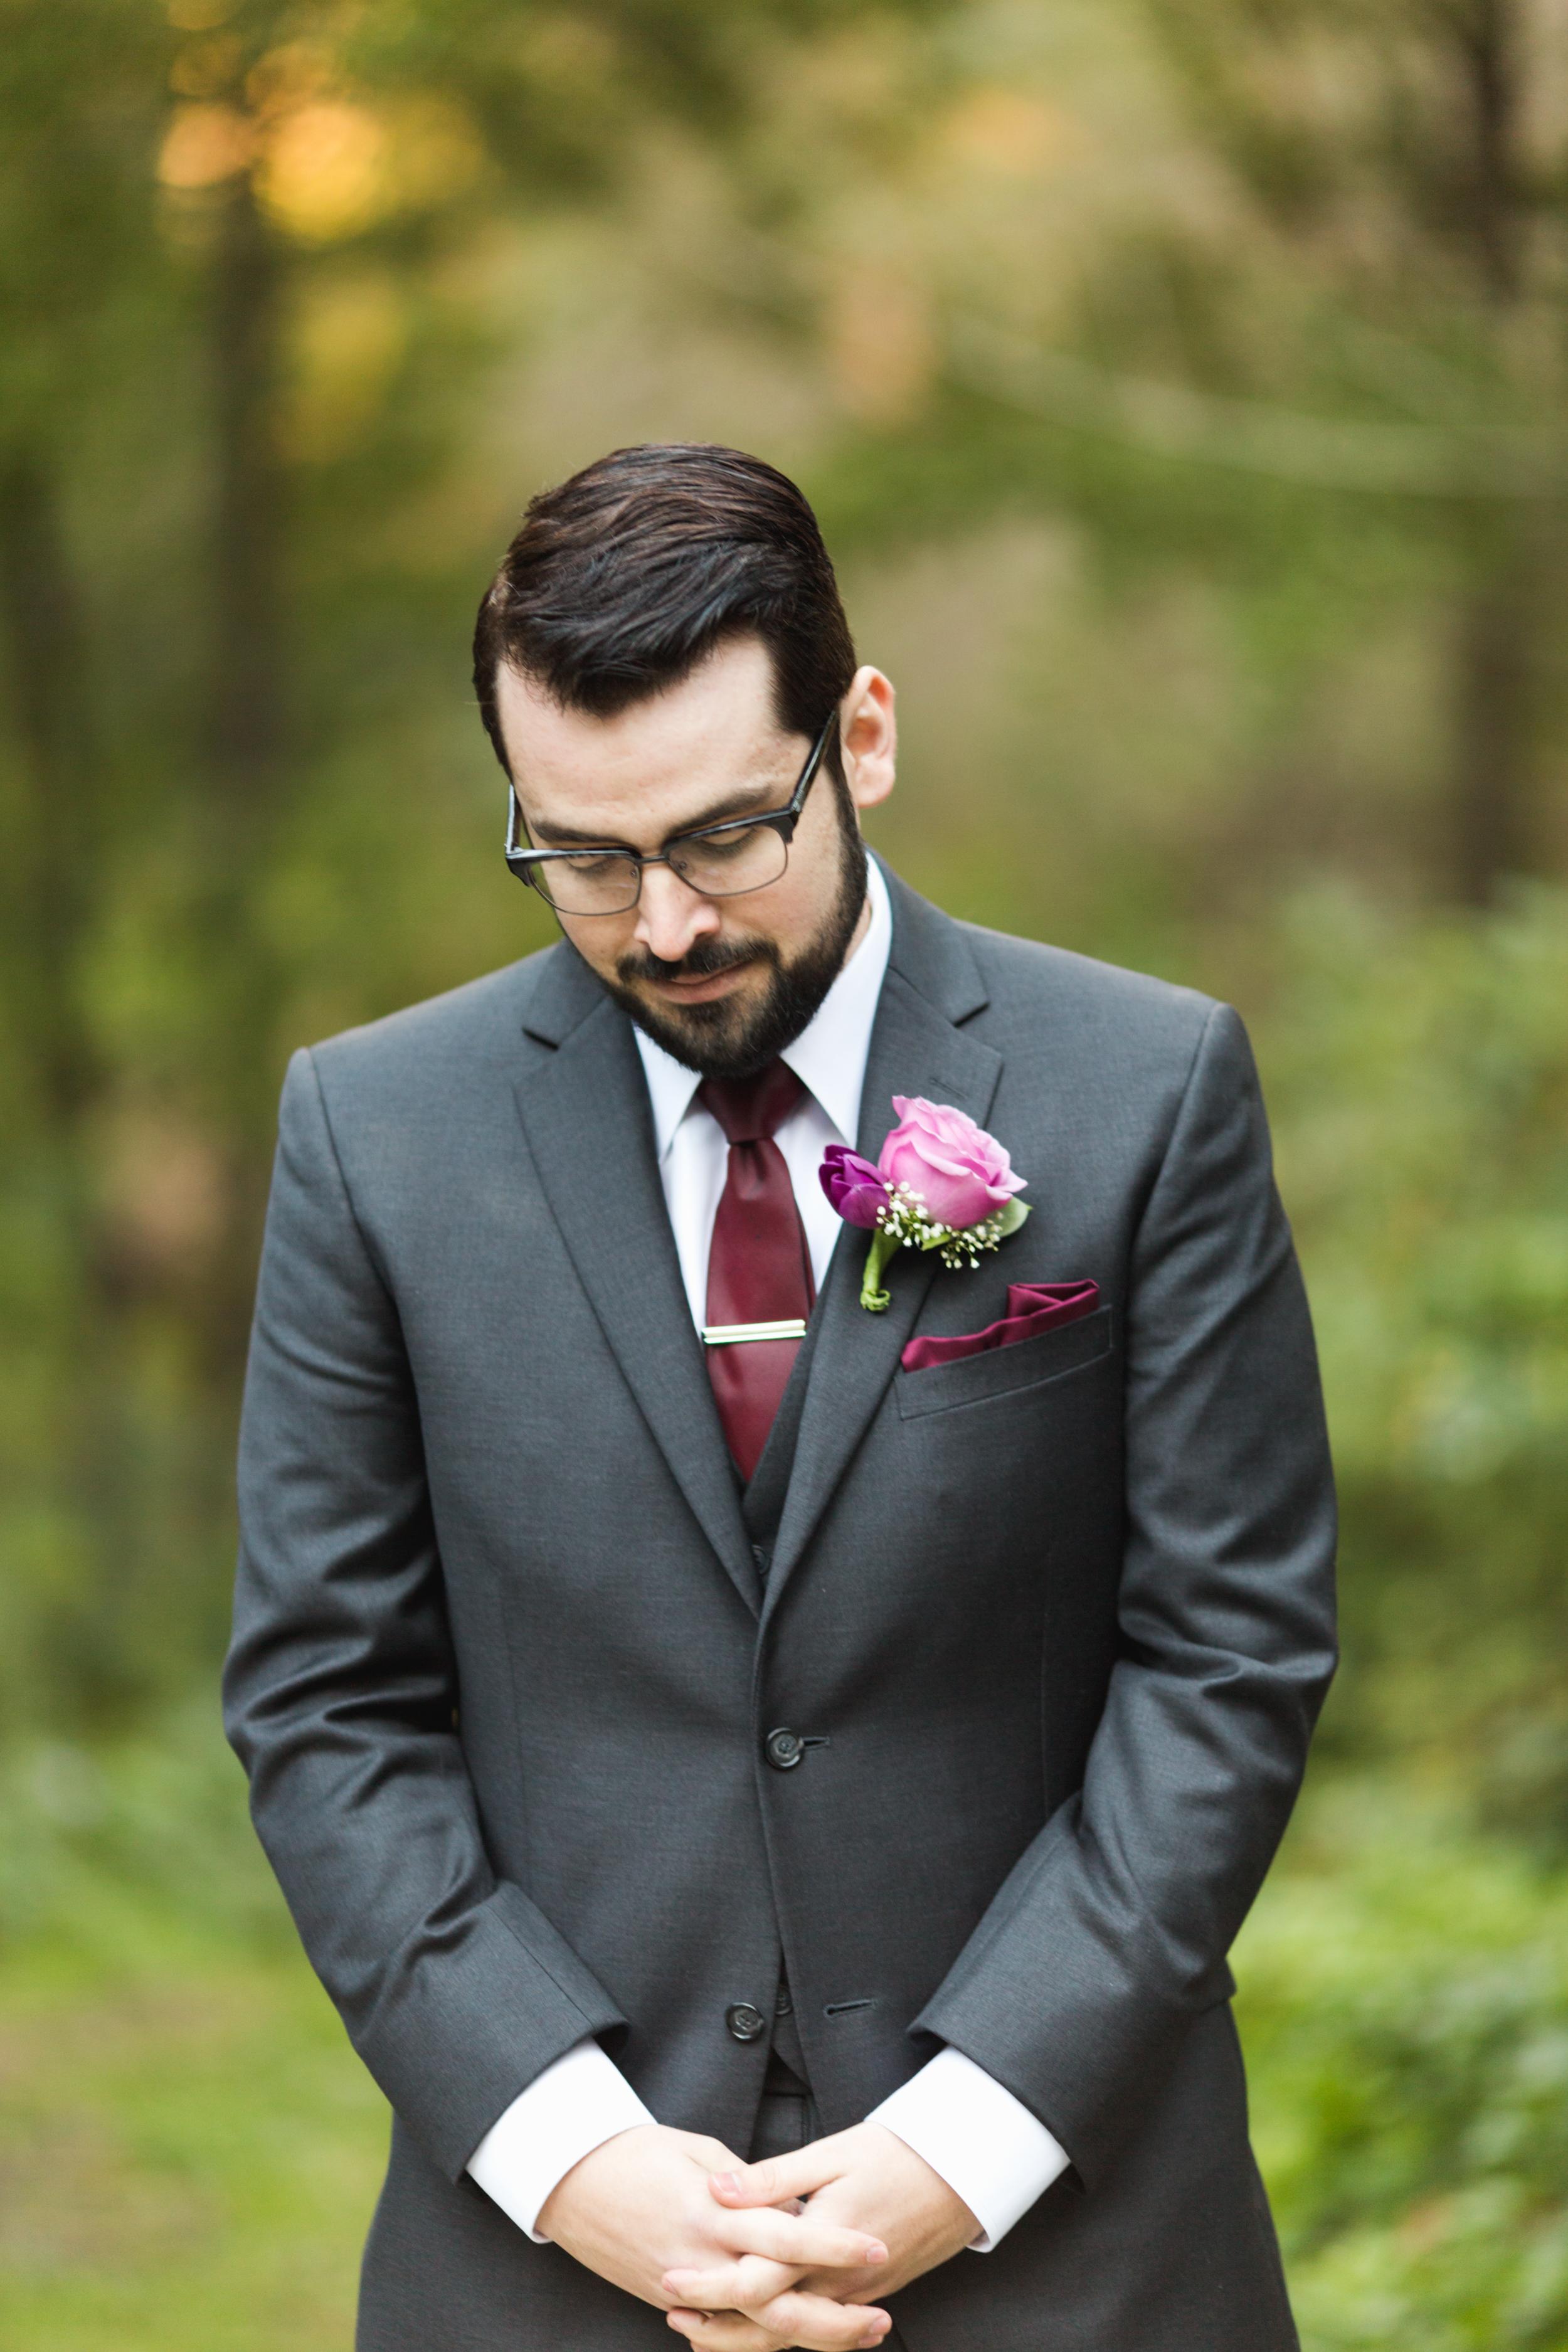 golden-gate-park-wedding-ceremony-groom